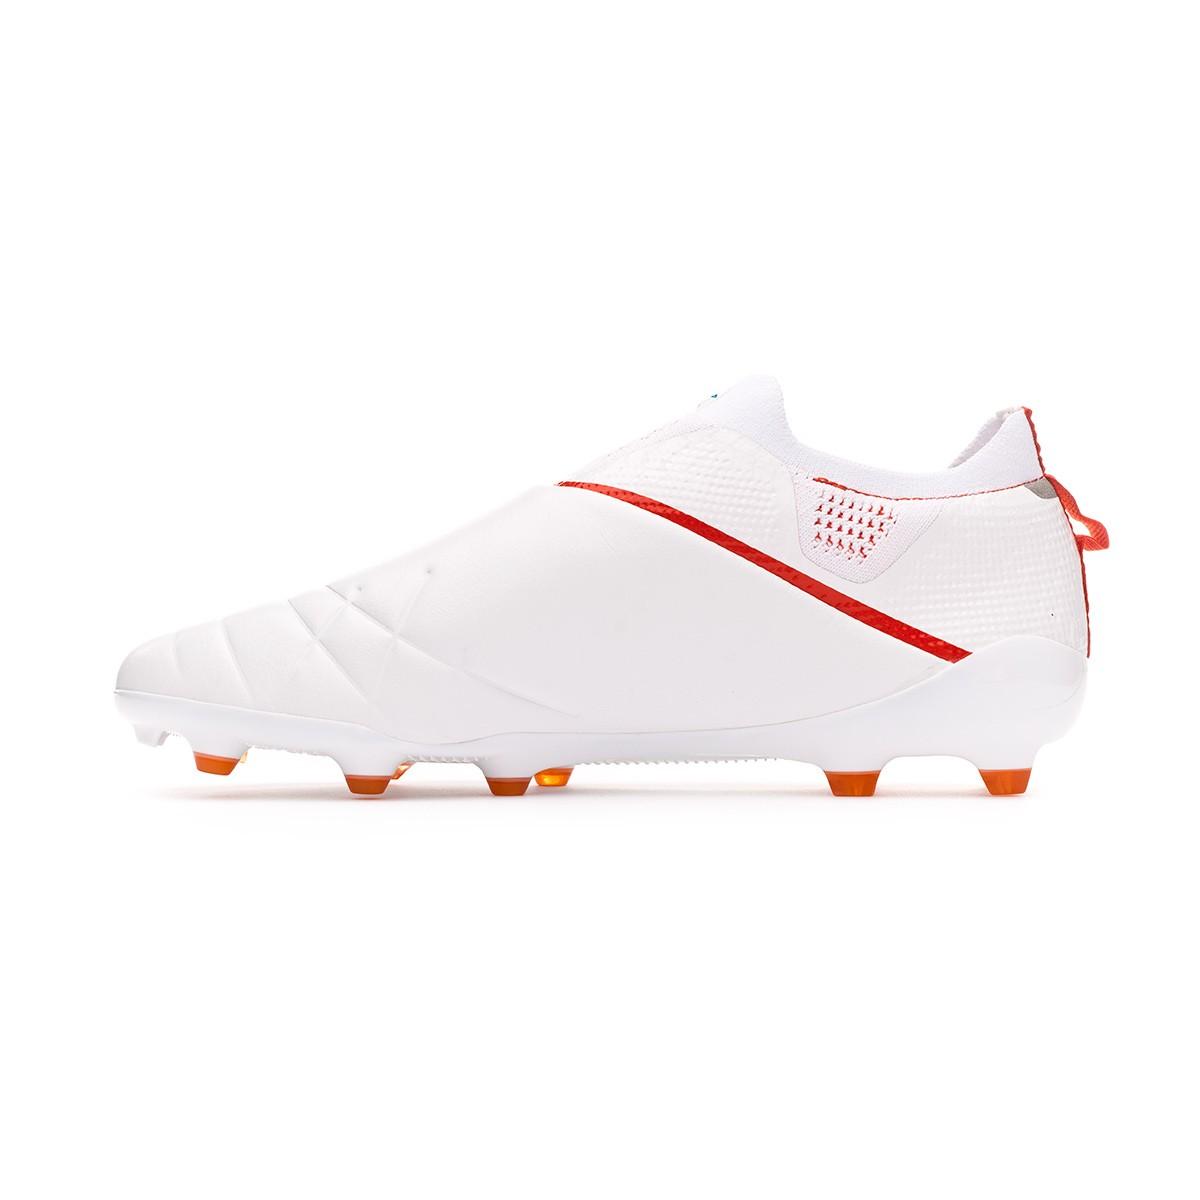 umbro laceless football boots